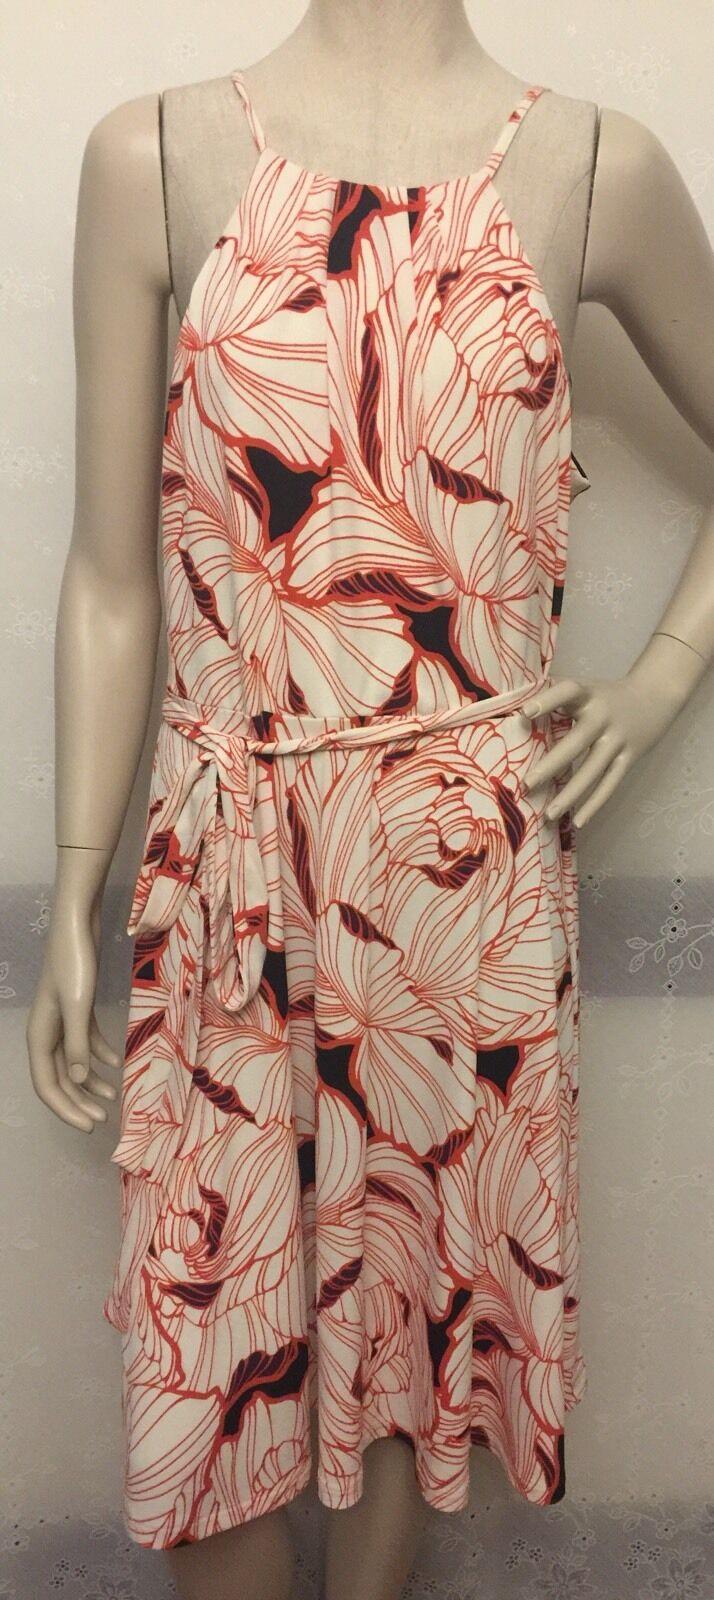 NWT Ann Taylor Floral Multi Farbe Sleeveless SZ XL Dress